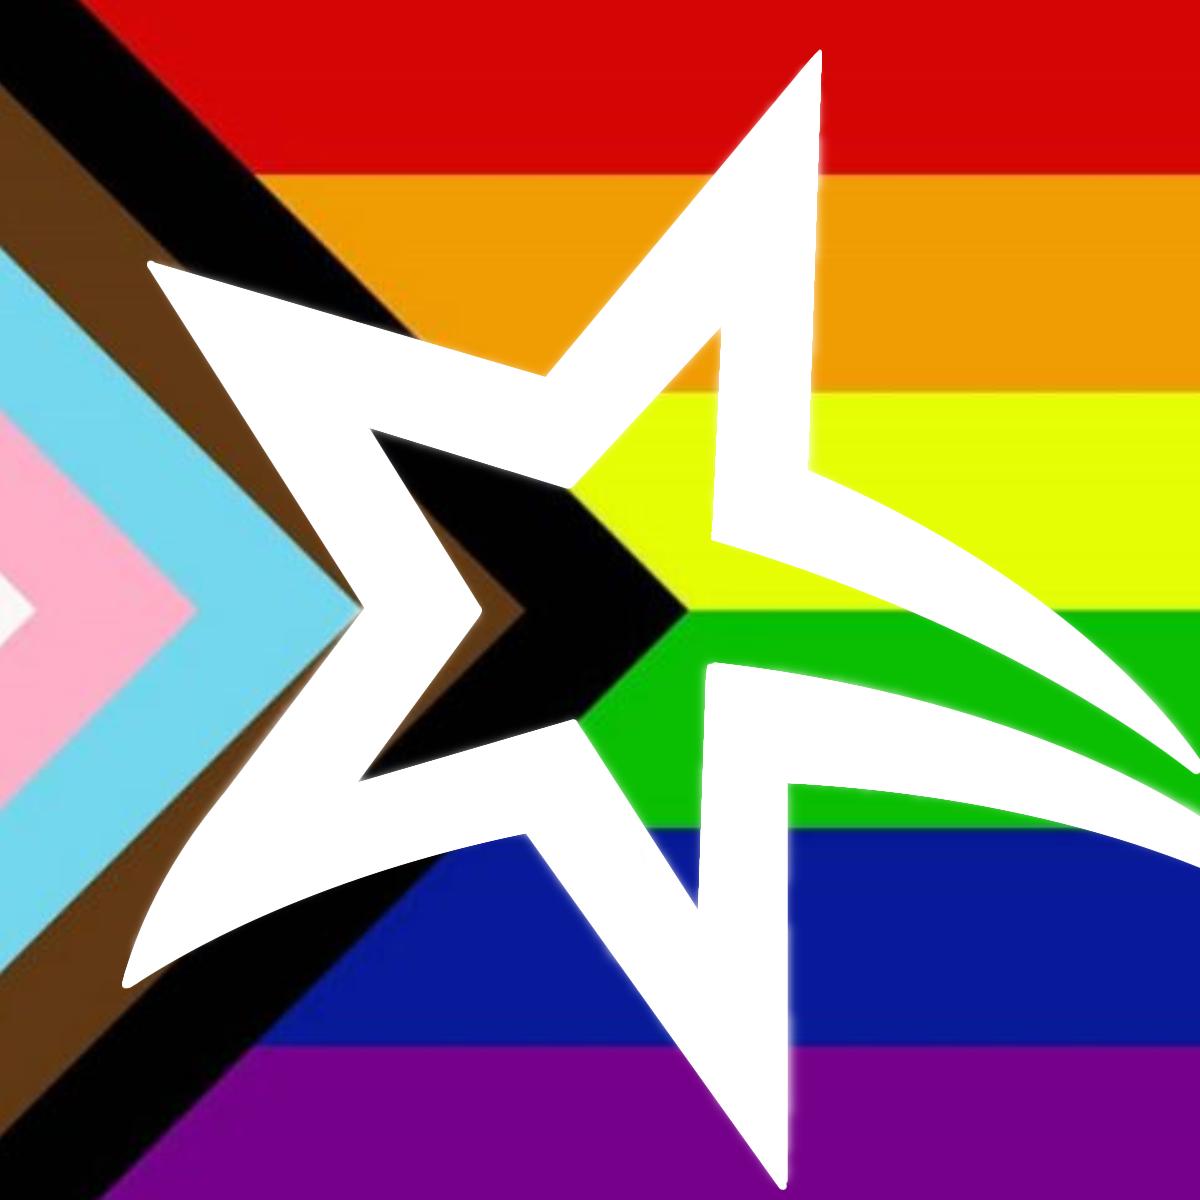 June is #PrideMonth